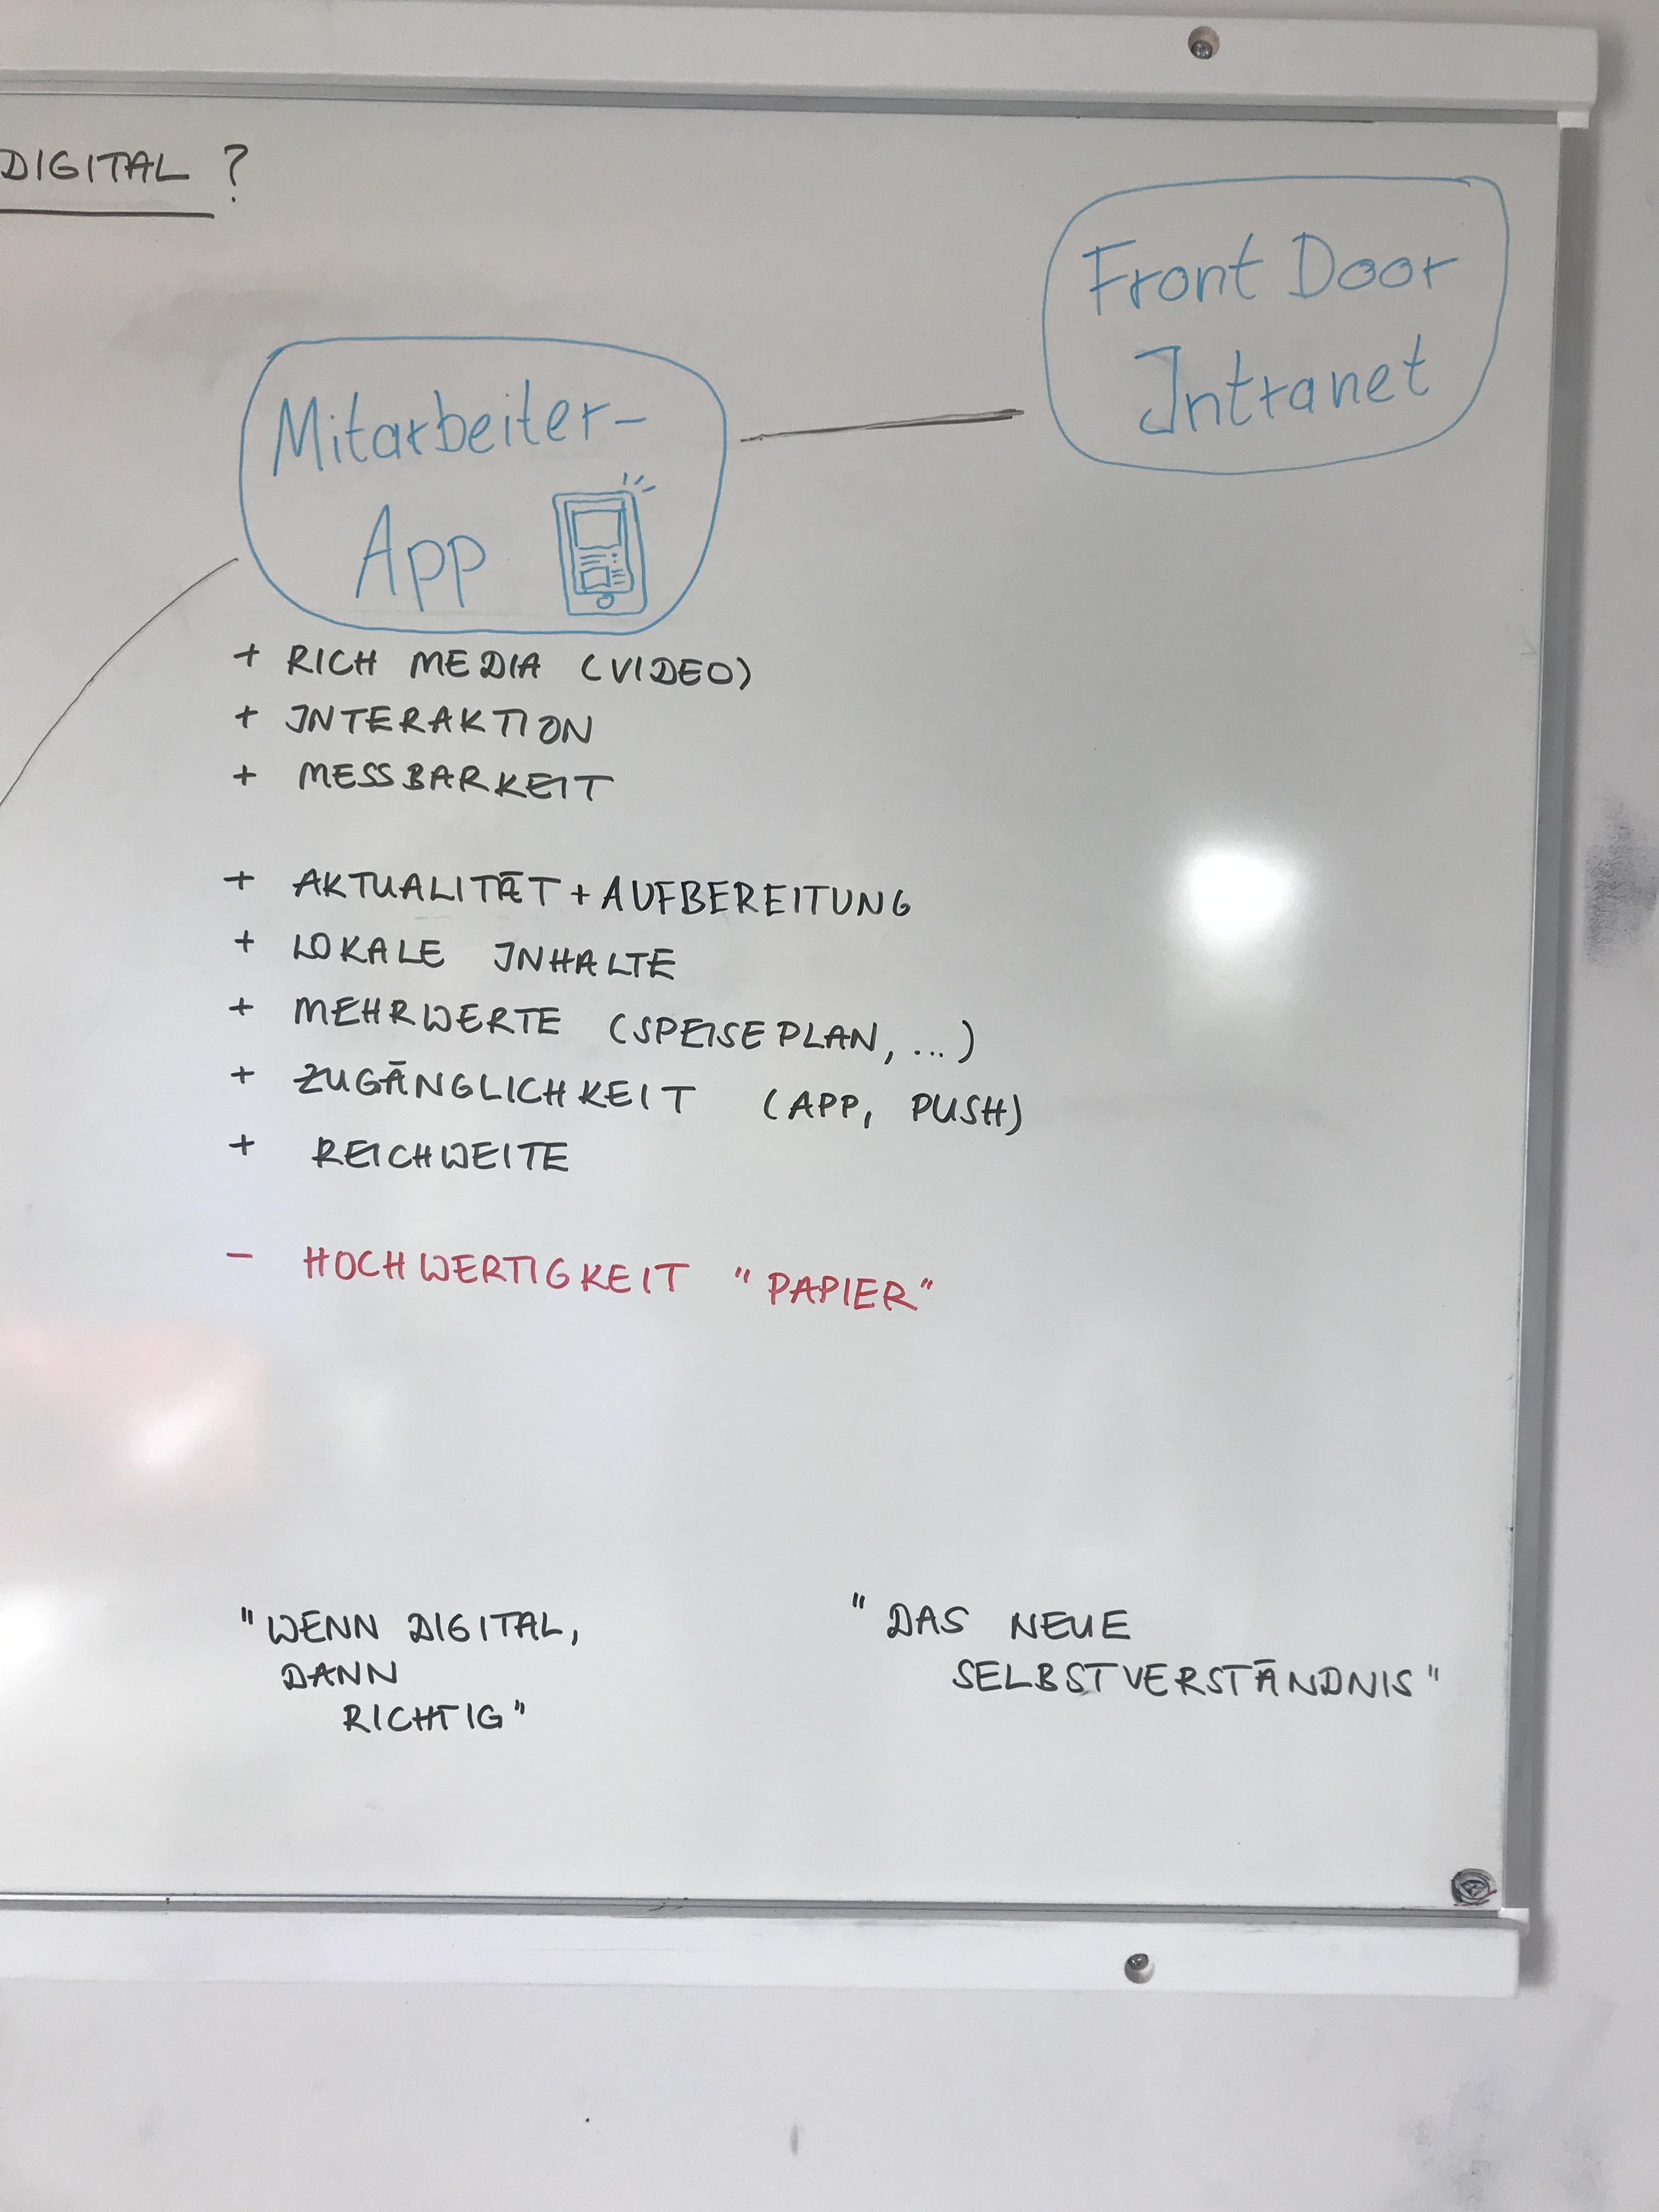 Mitarbeiter-App und Front Door Intranet